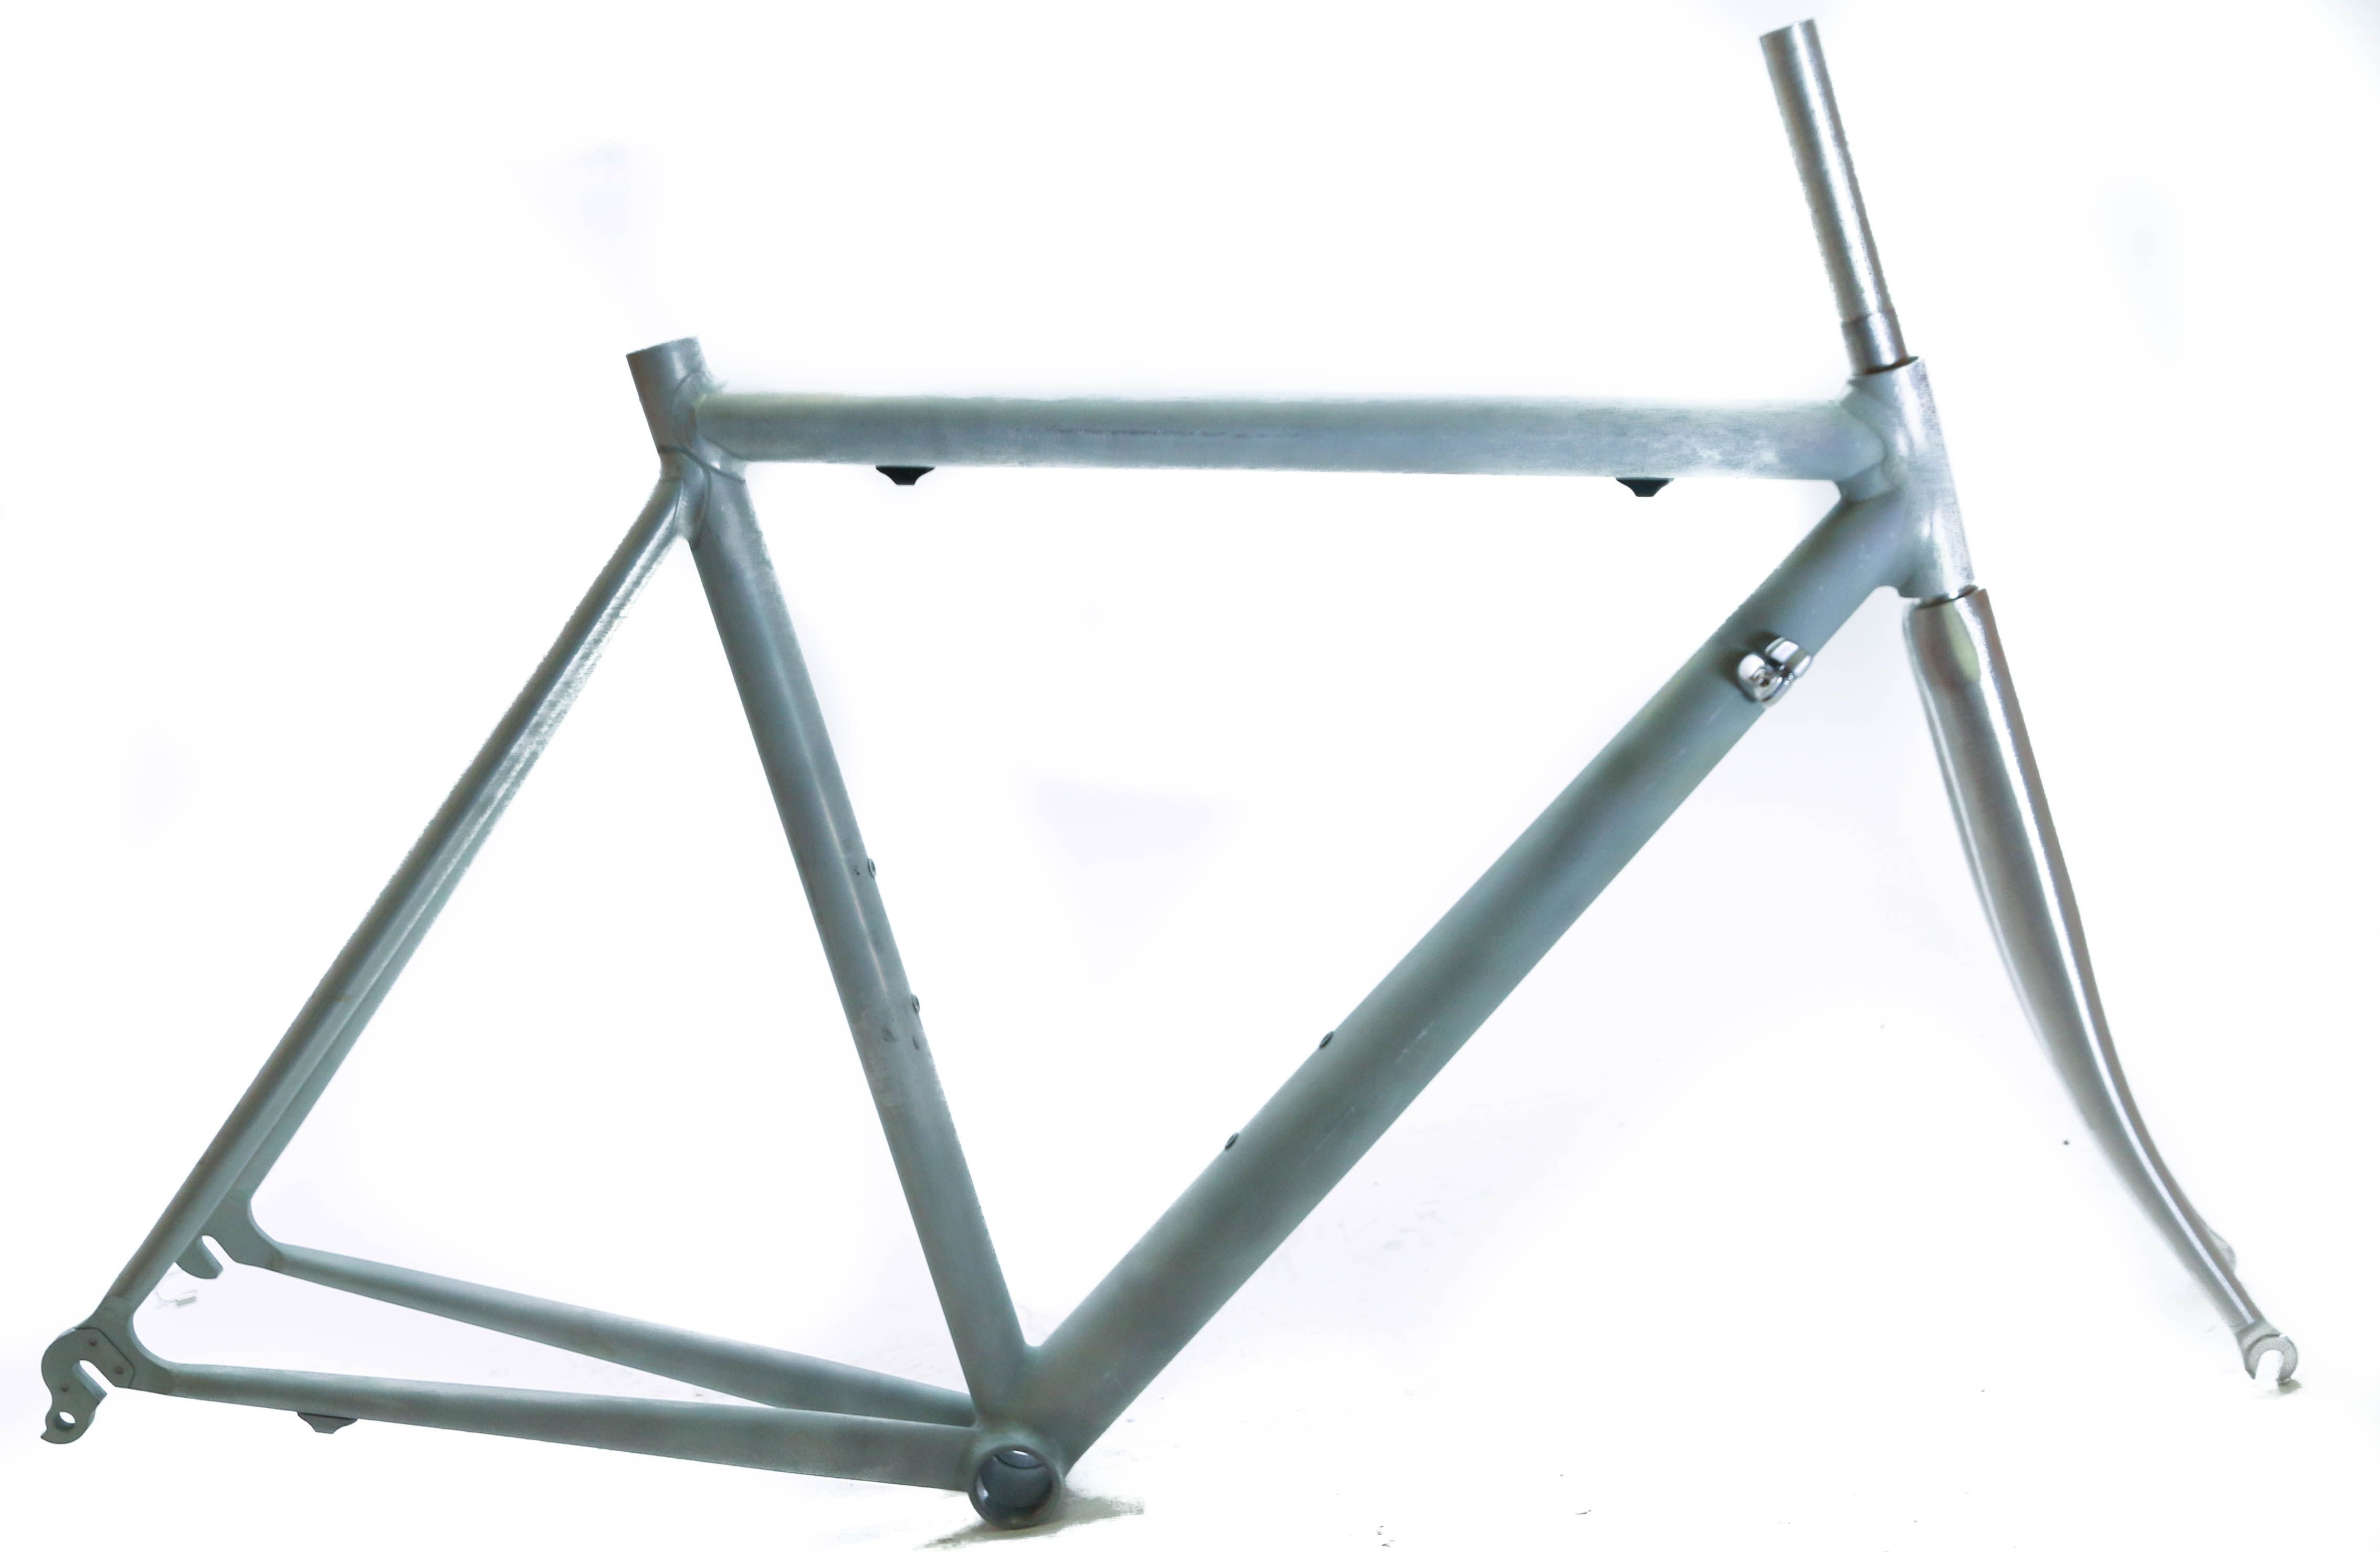 italian dedacciai raw 7003 aluminum road bike frameset fork new sporting goods cycling bicycle frames ebay